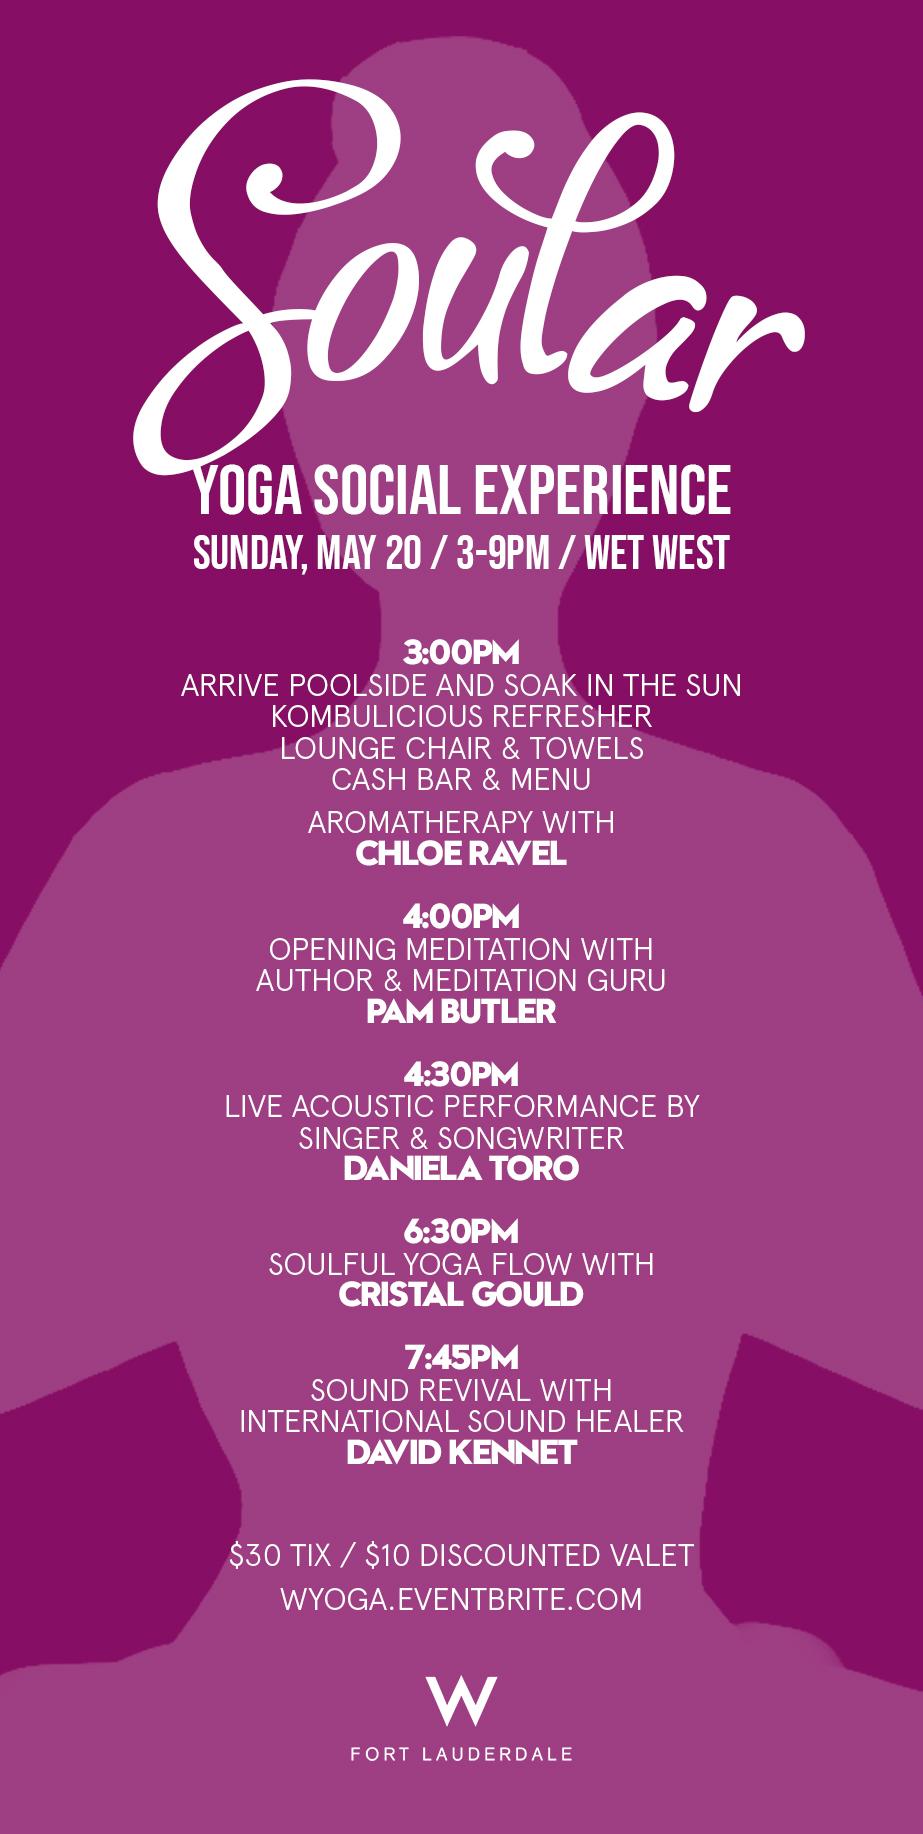 Soular: Yoga Social Experience